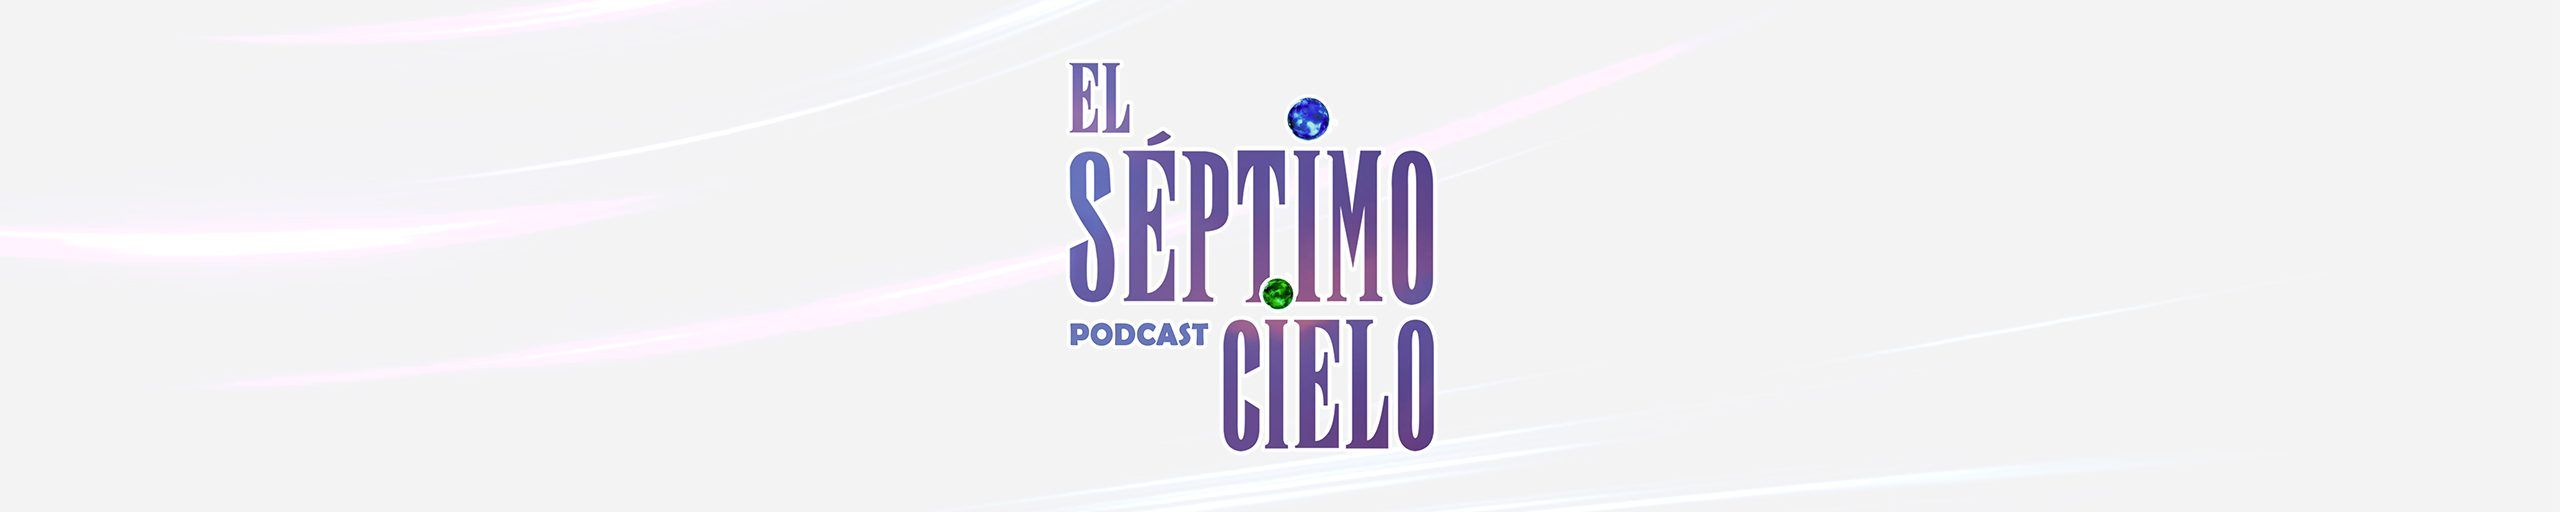 El Séptimo Cielo Podcast